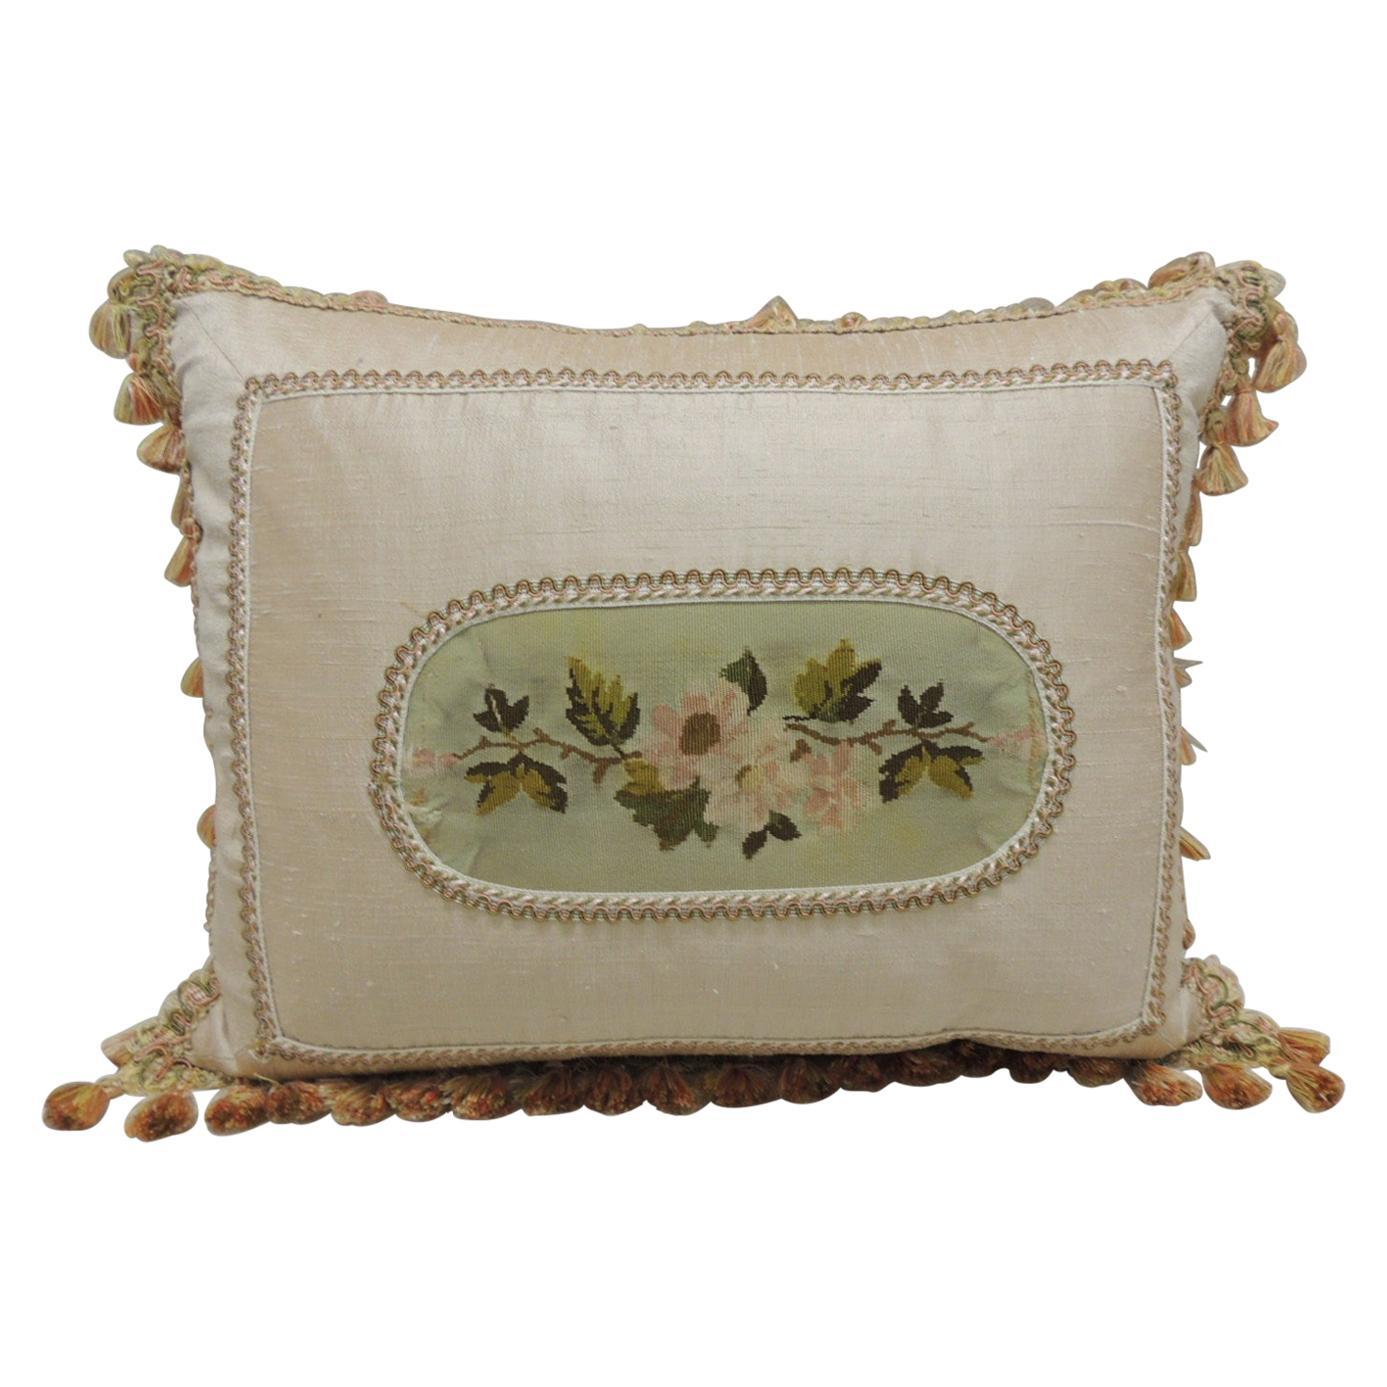 Antique Aubusson Center Tapestry Decorative Pillow